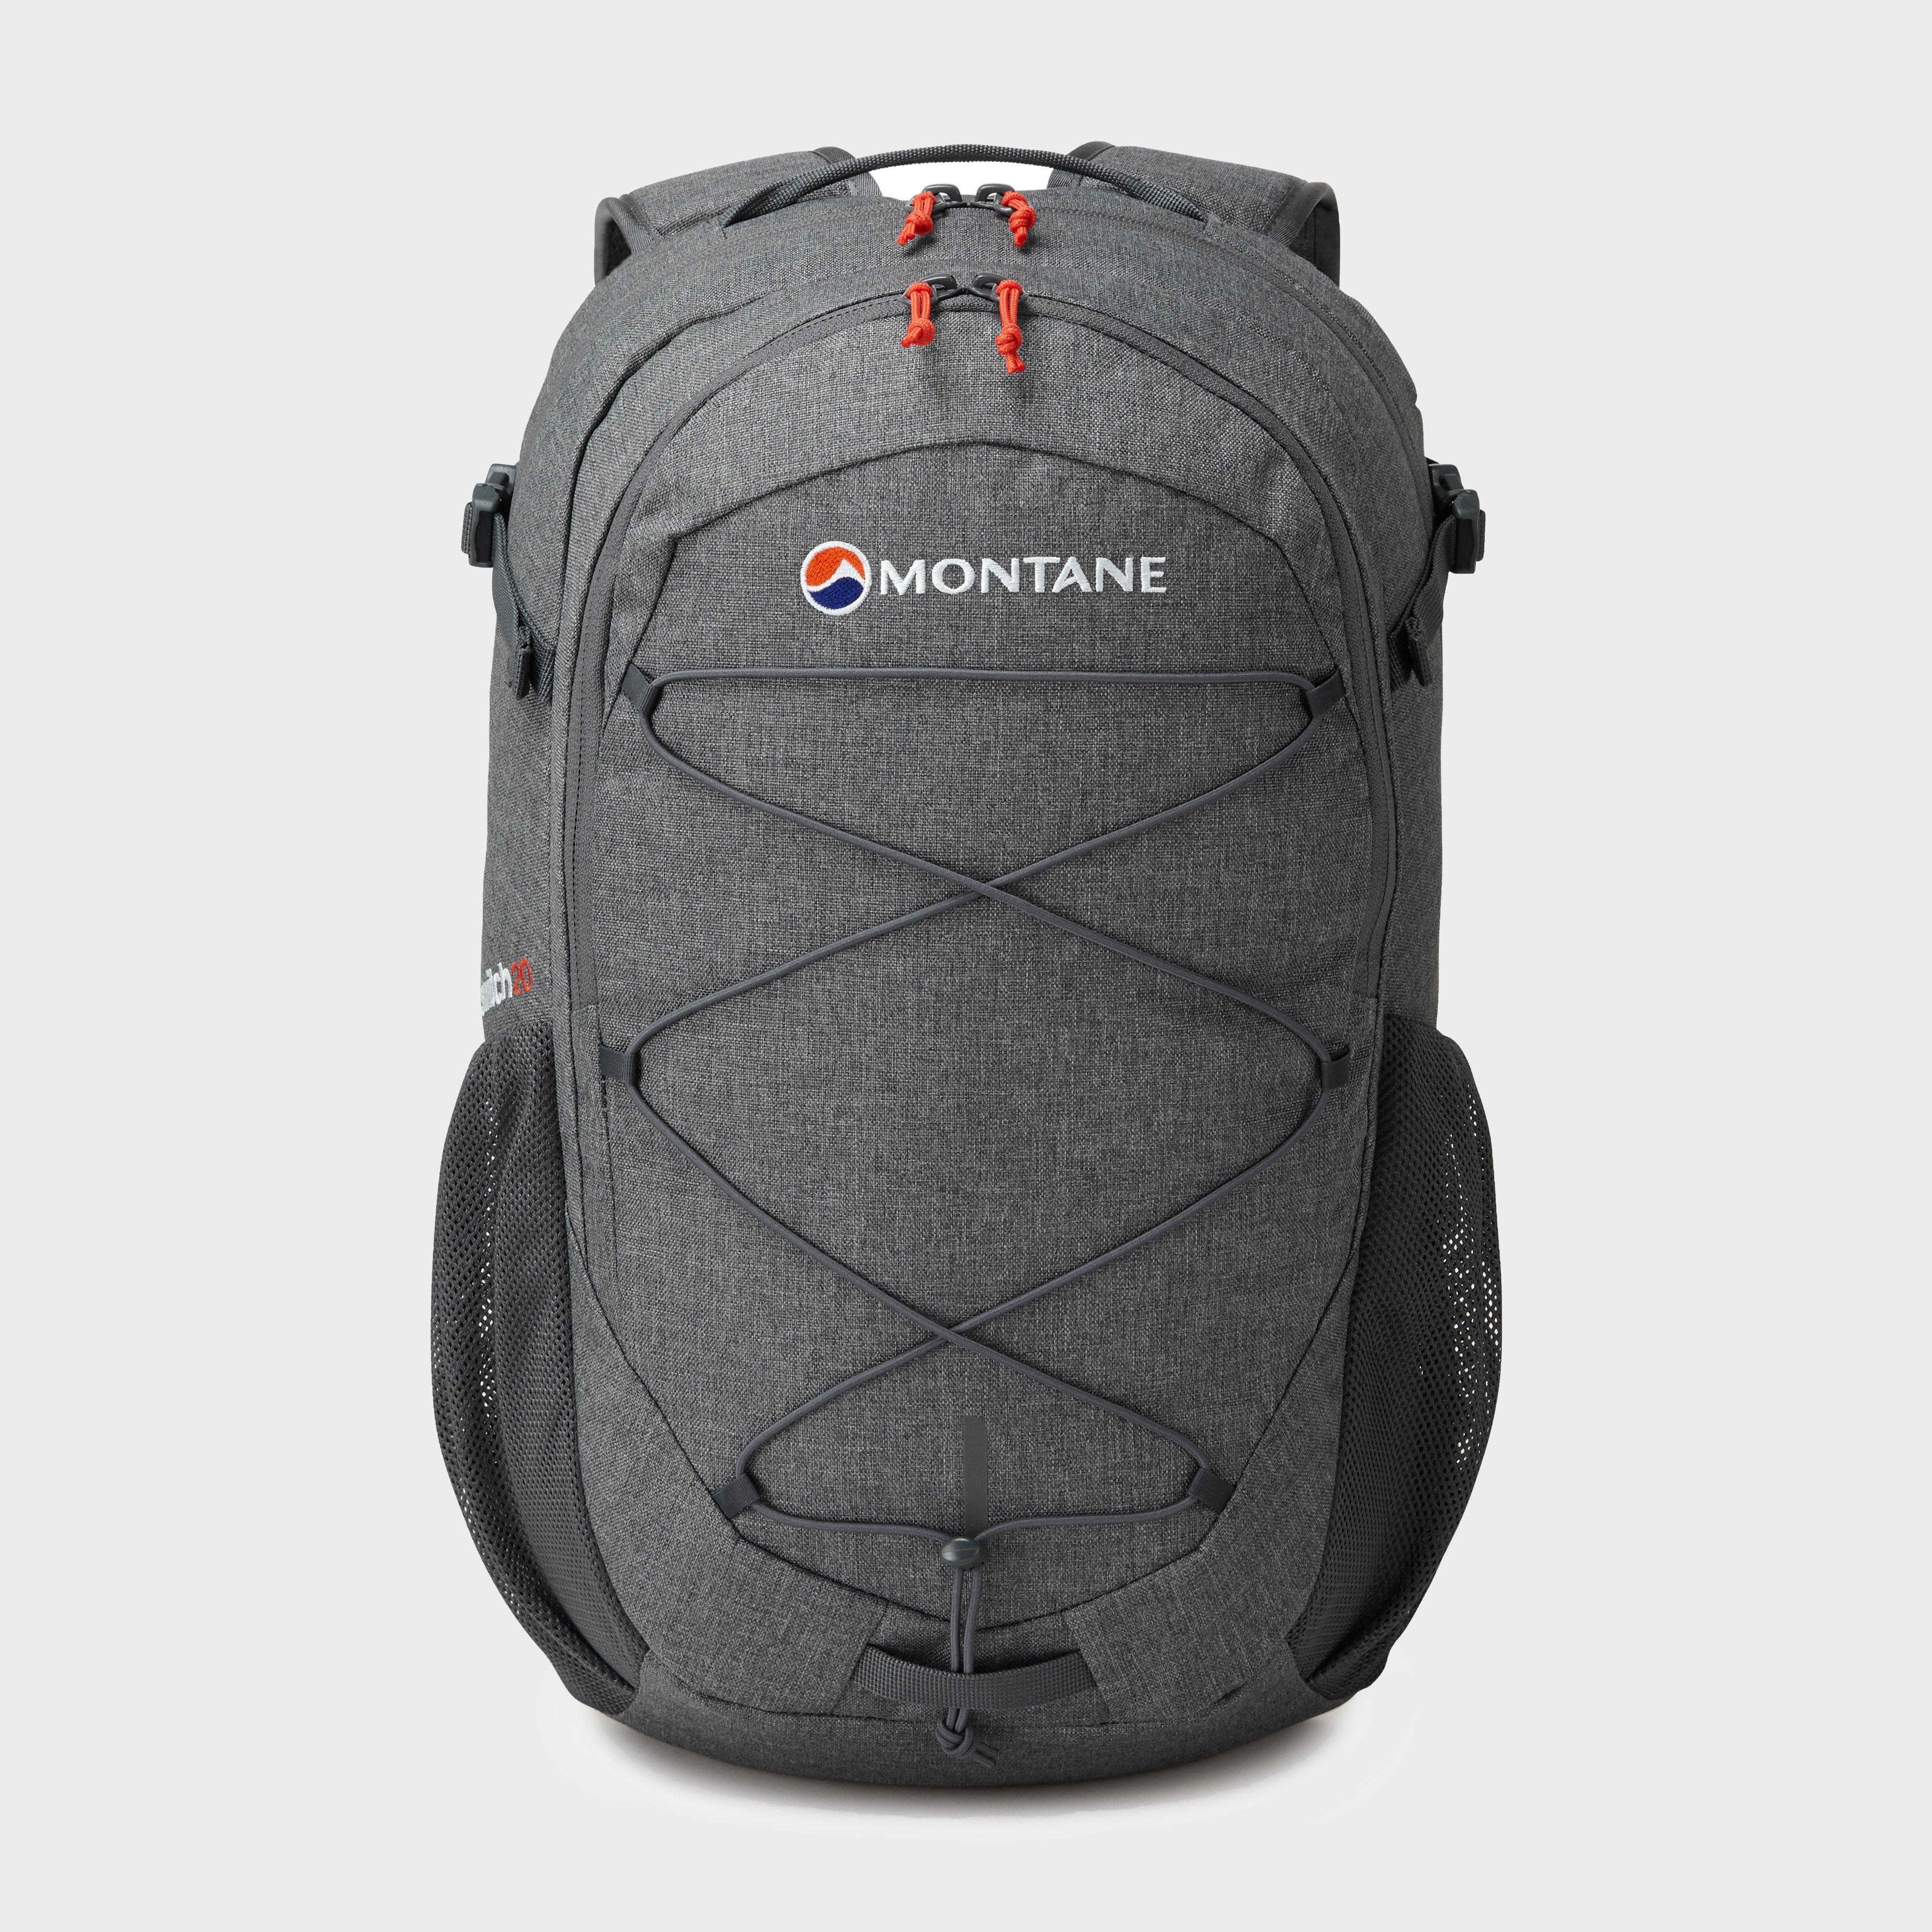 Montane Montane Switch 20 Daypack, Grey